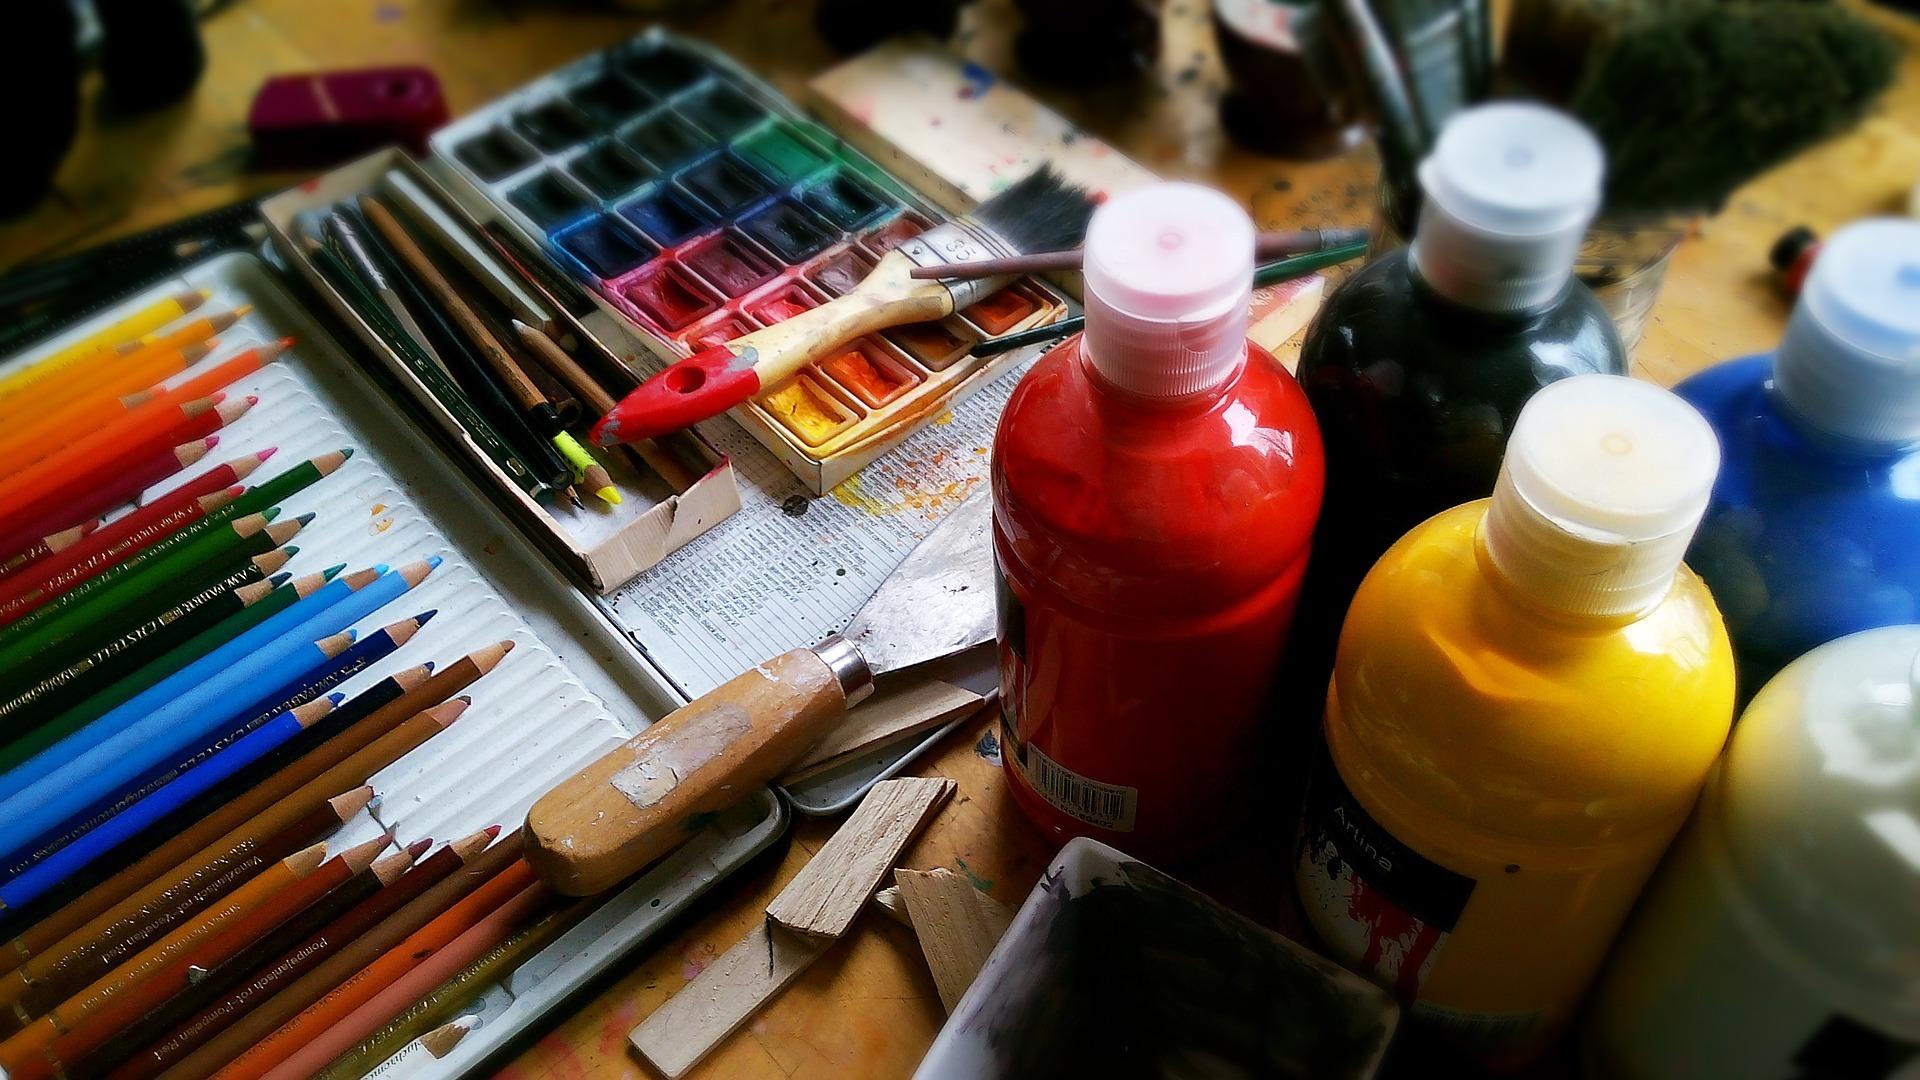 Saint-Lambert artists honoured at the multi-purpose centre